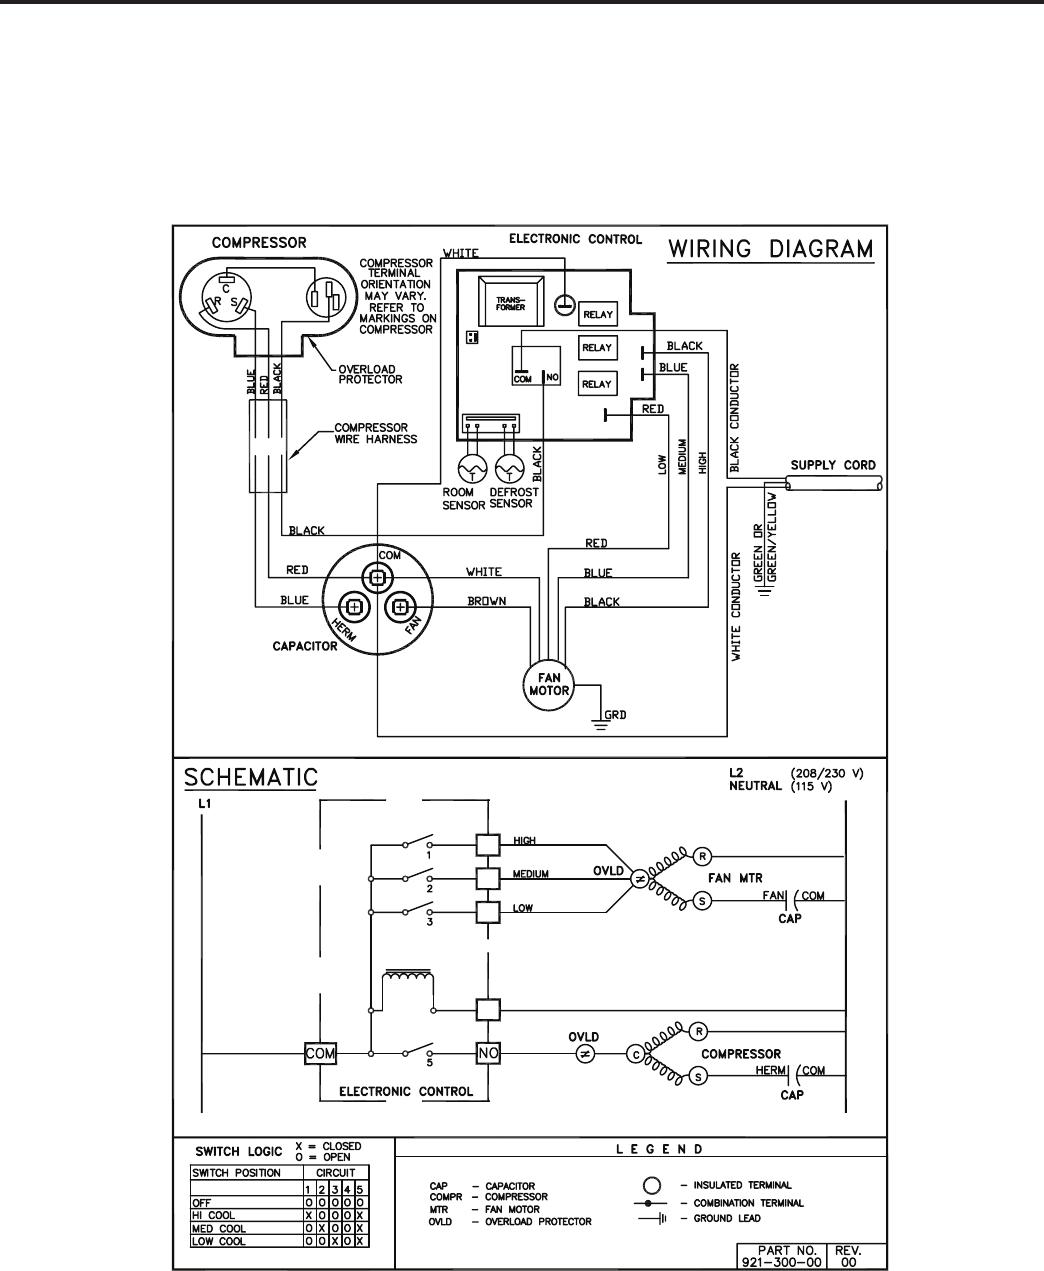 Conditioner wiring diagram friedrich wallmaster ws10b10 users manual p2kpd 1 05